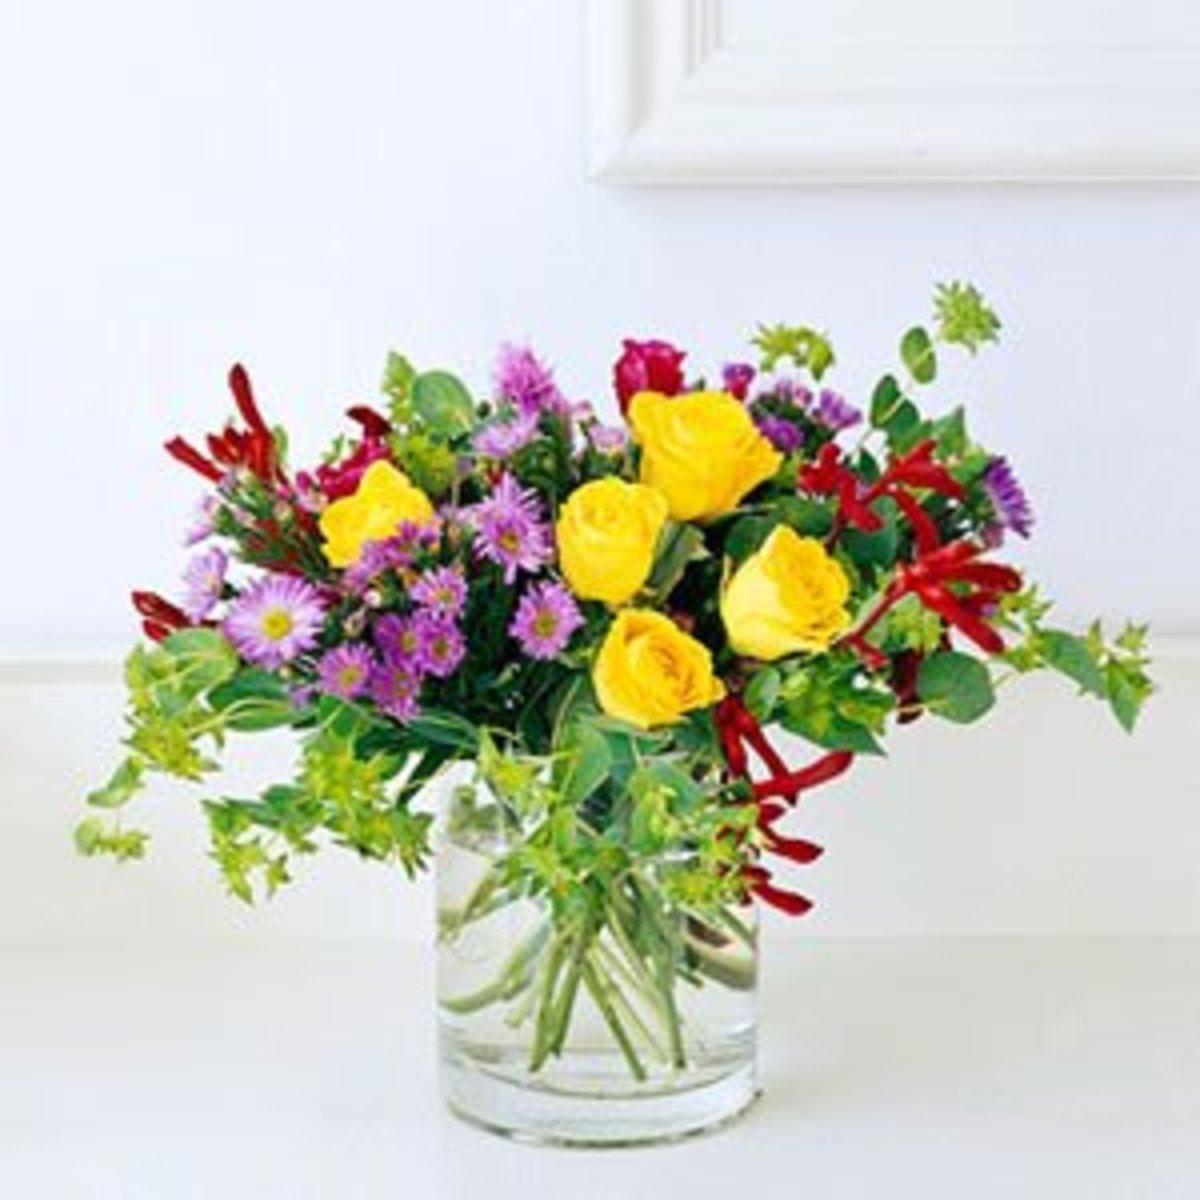 Flower Arranging Instructions